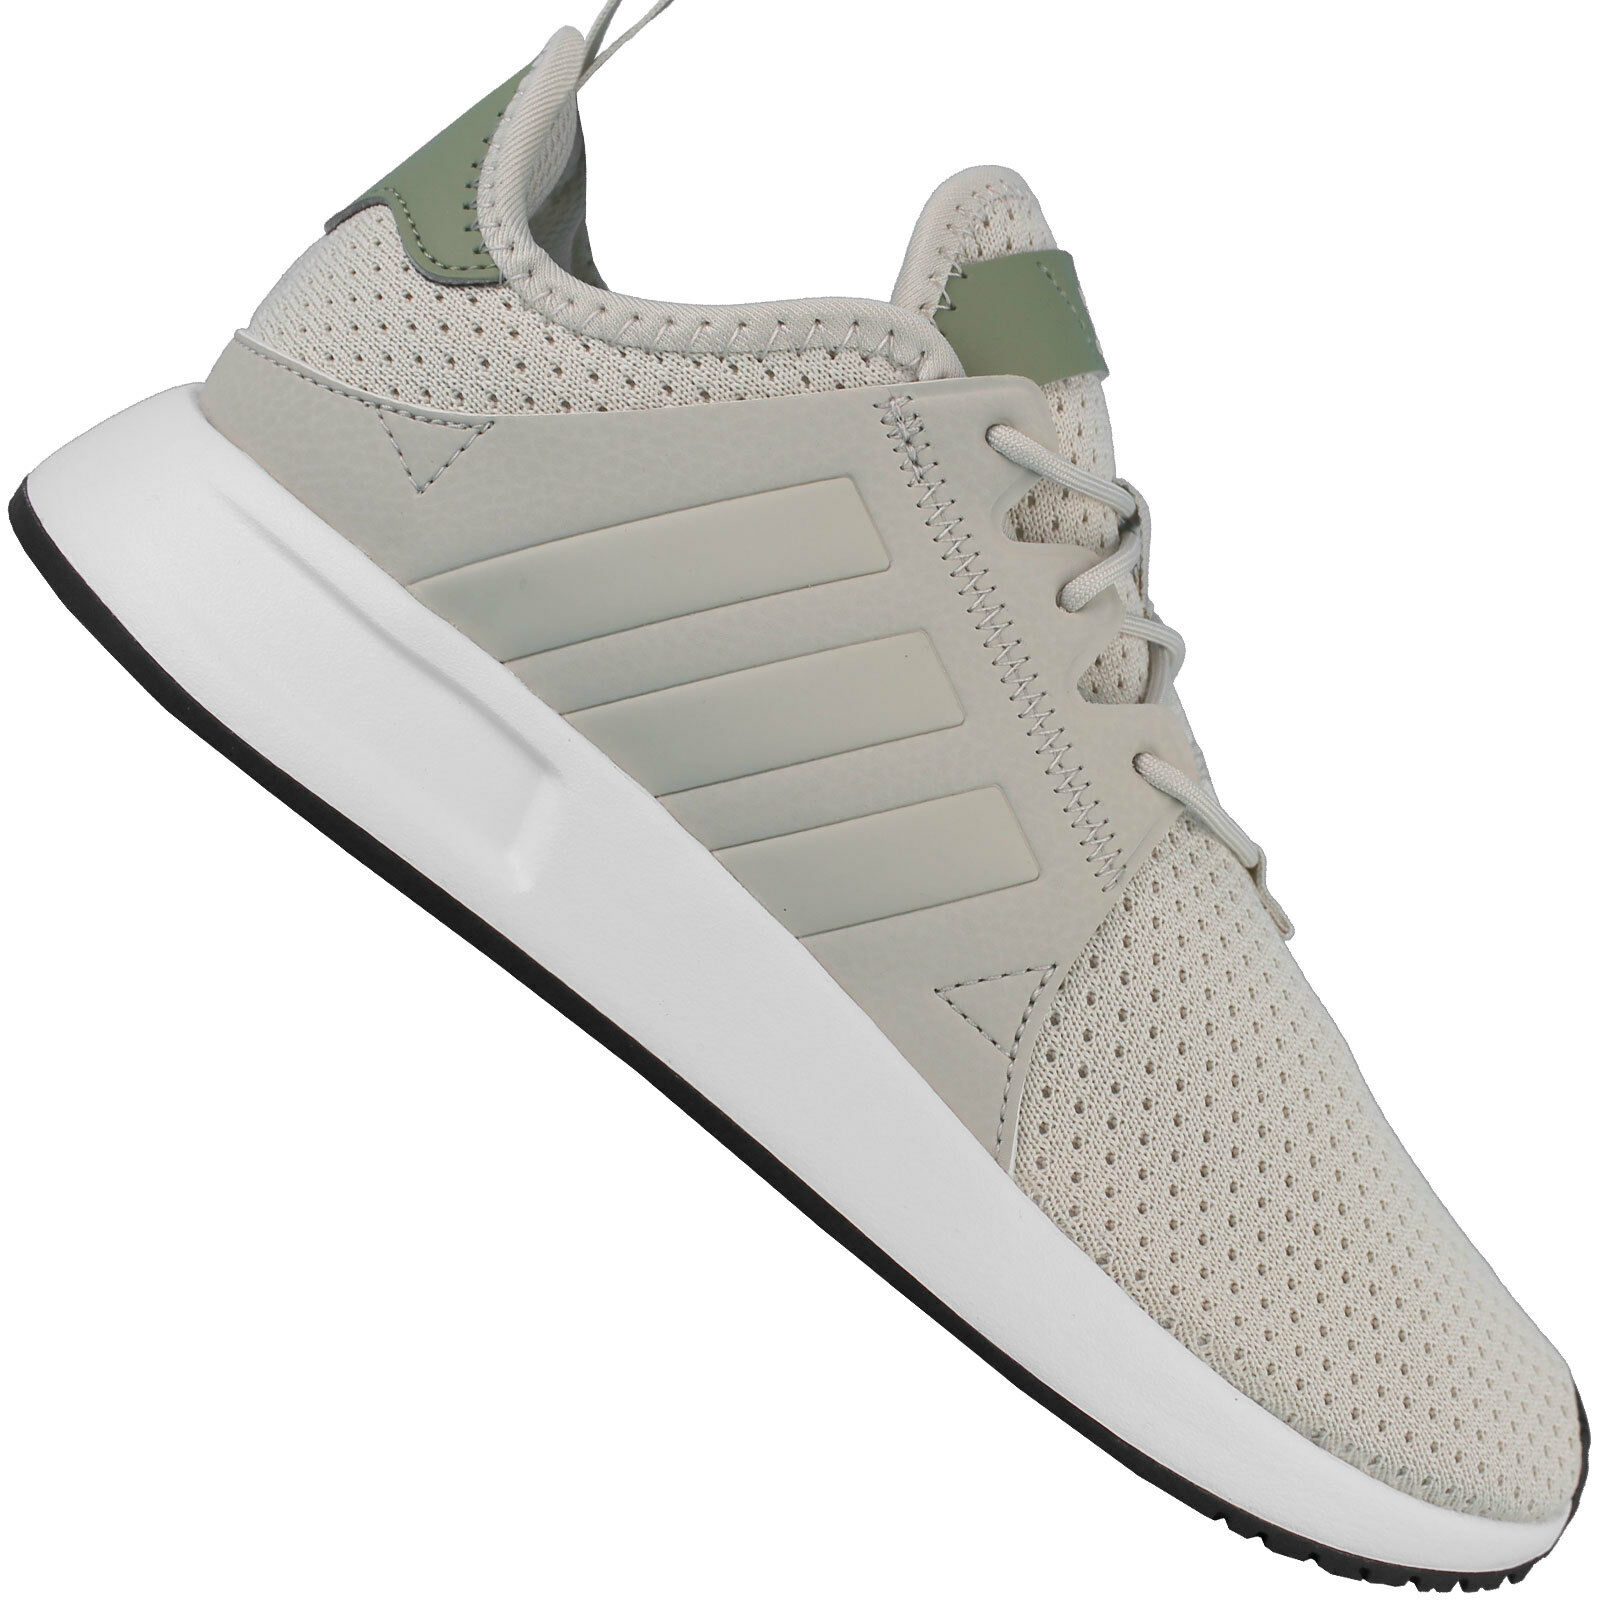 Adidas Laufschuhe Originals x_plr kinder-sportschuhe explorer Sneaker Turnschuhe Laufschuhe Adidas 1afa74